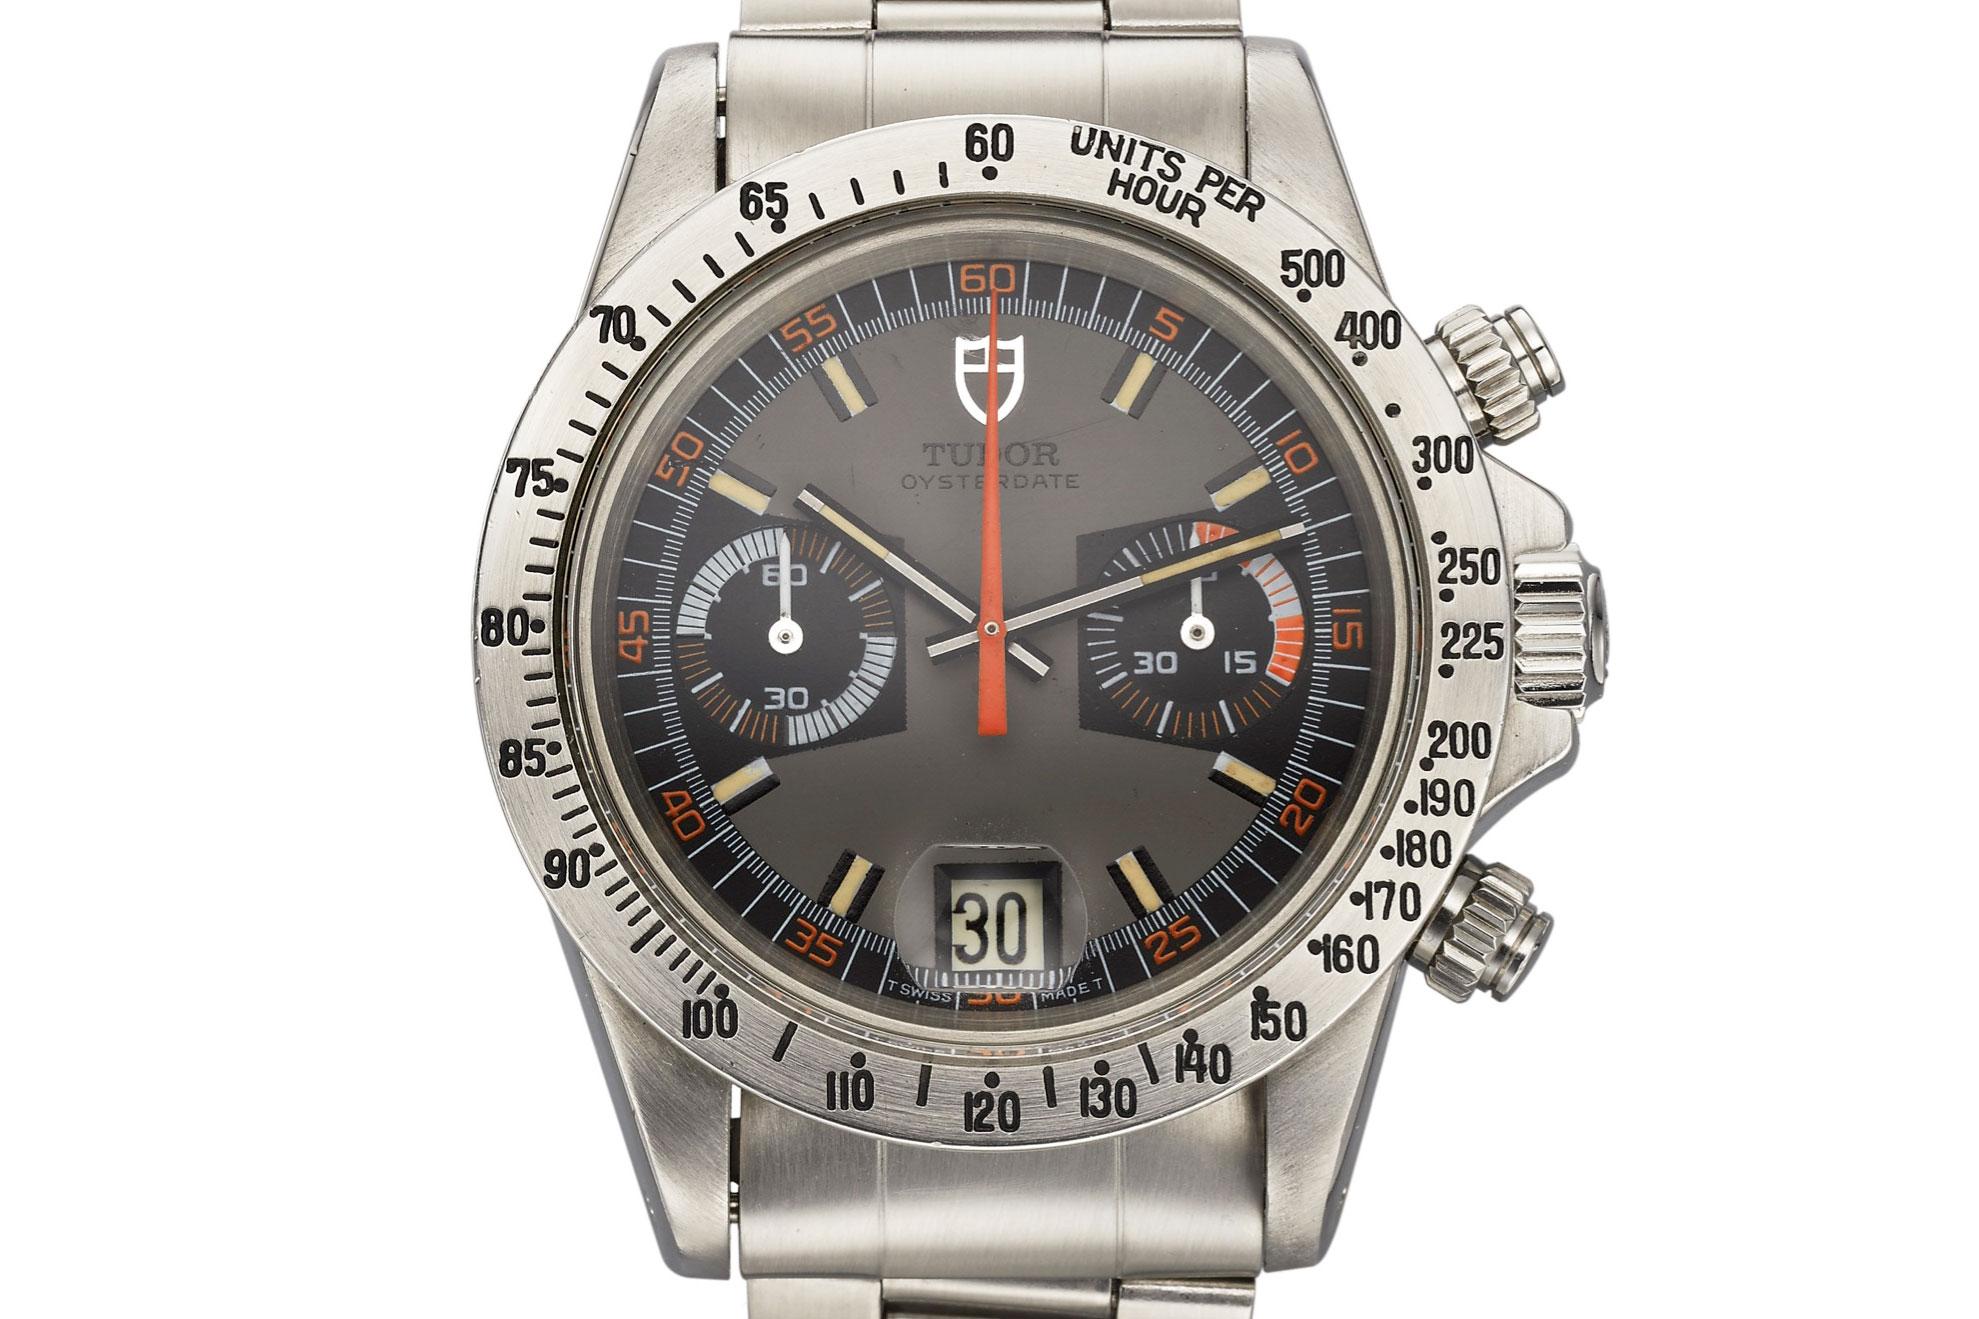 Tudor Monte Carlo Chronograph (Lot 247)